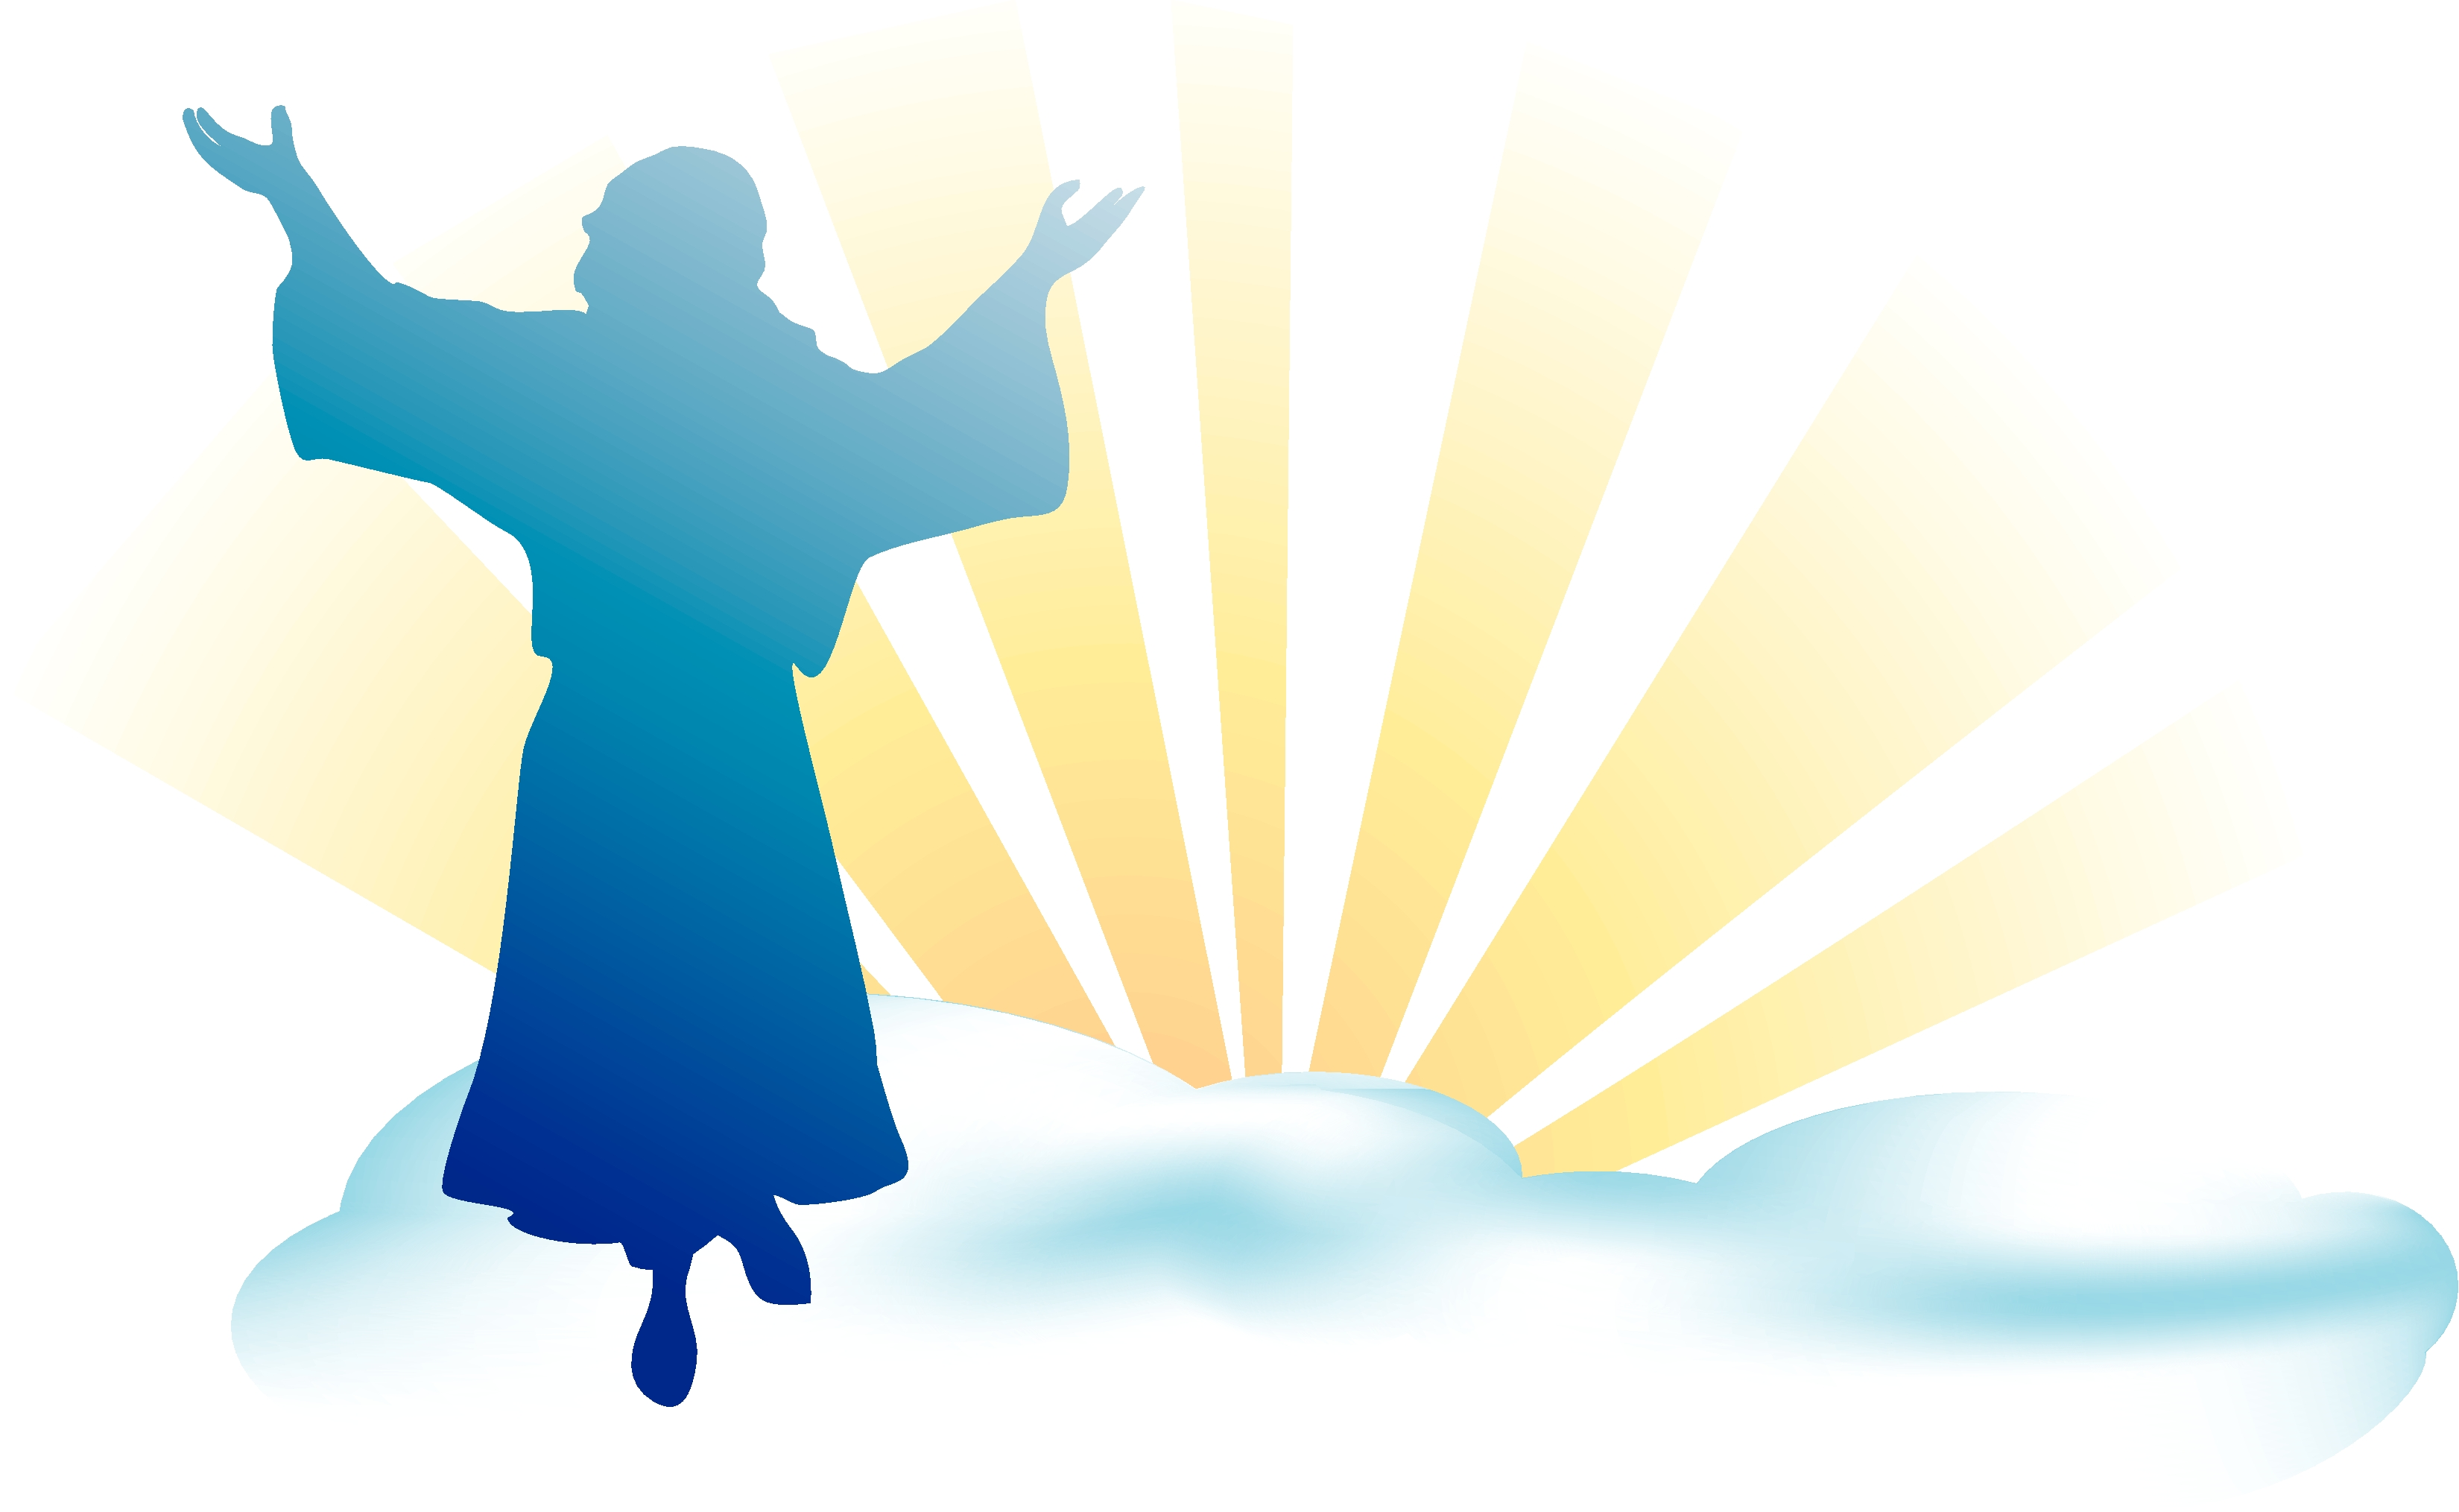 Jesus kingdom clipart freeuse Jesus kingdom clipart - ClipartFest freeuse